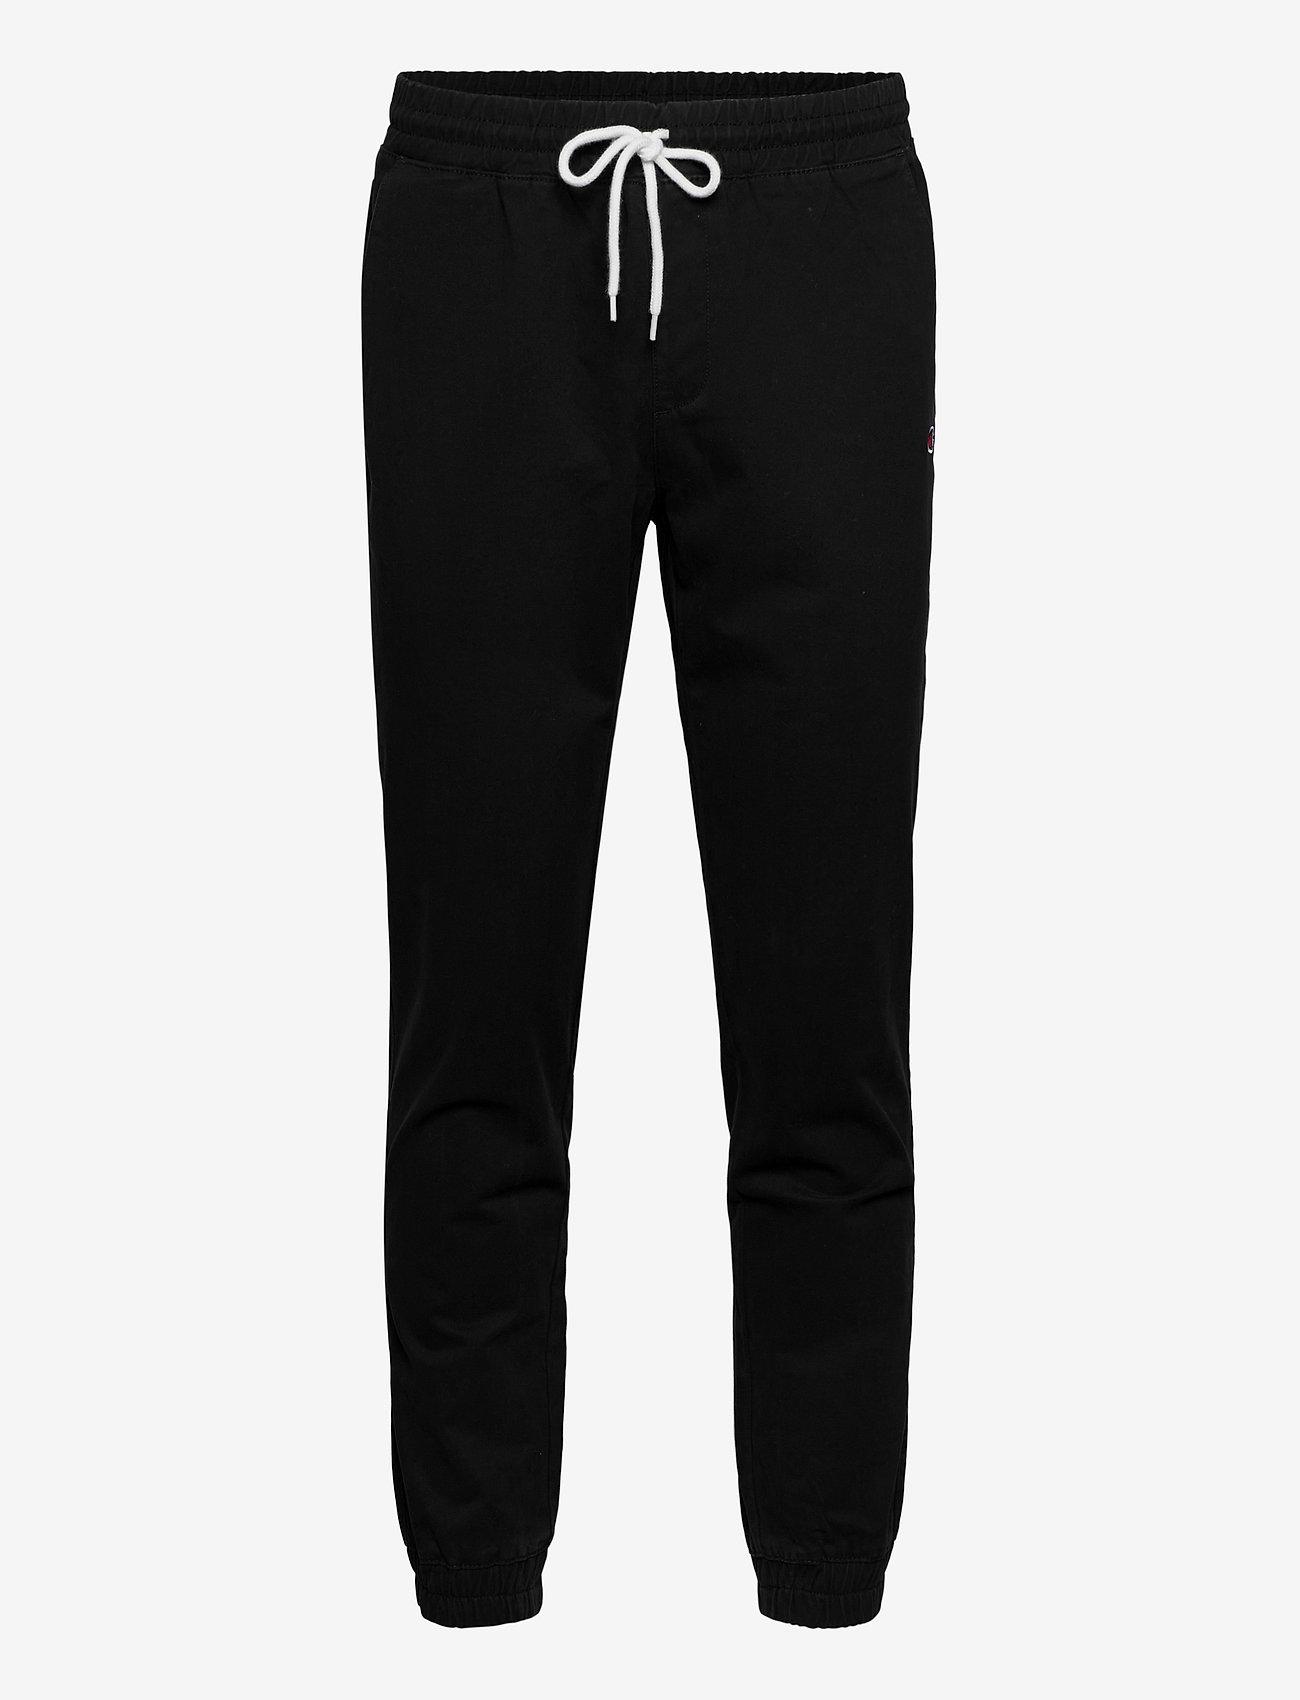 Champion Elastic Cuff Pants - Joggebukser BLACK BEAUTY - Menn Klær